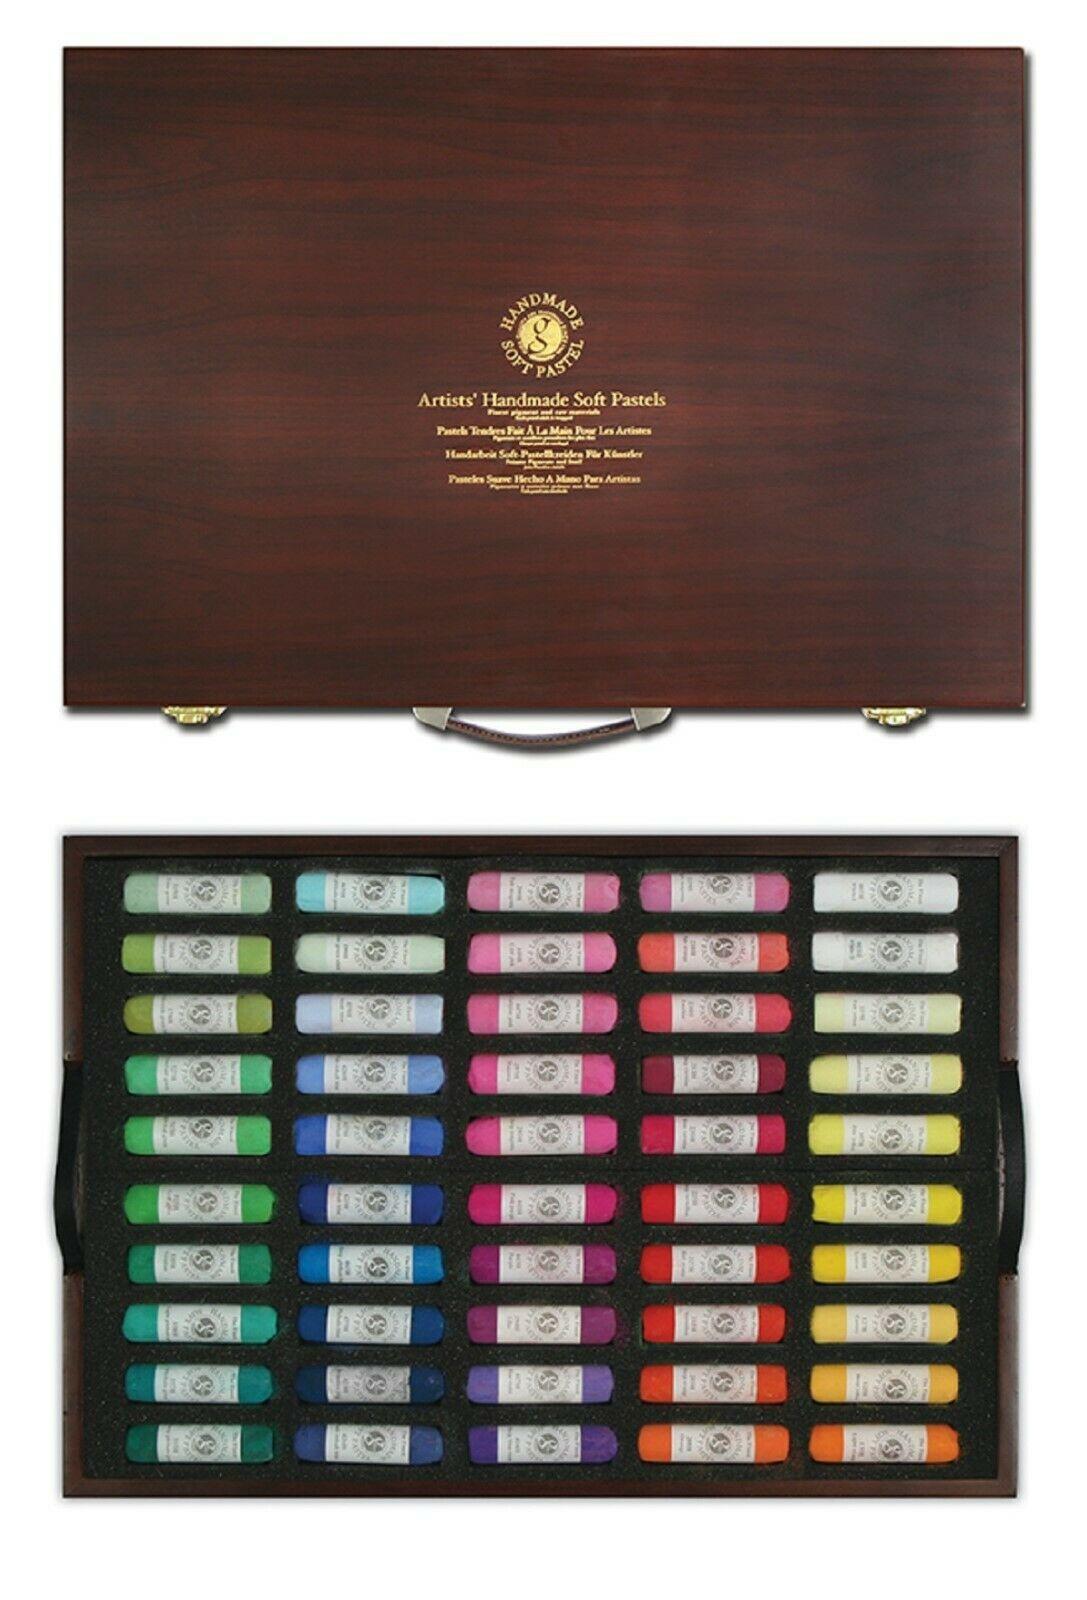 Mungyo Artists Handmade Soft Pastels 100 Colors Set image 3